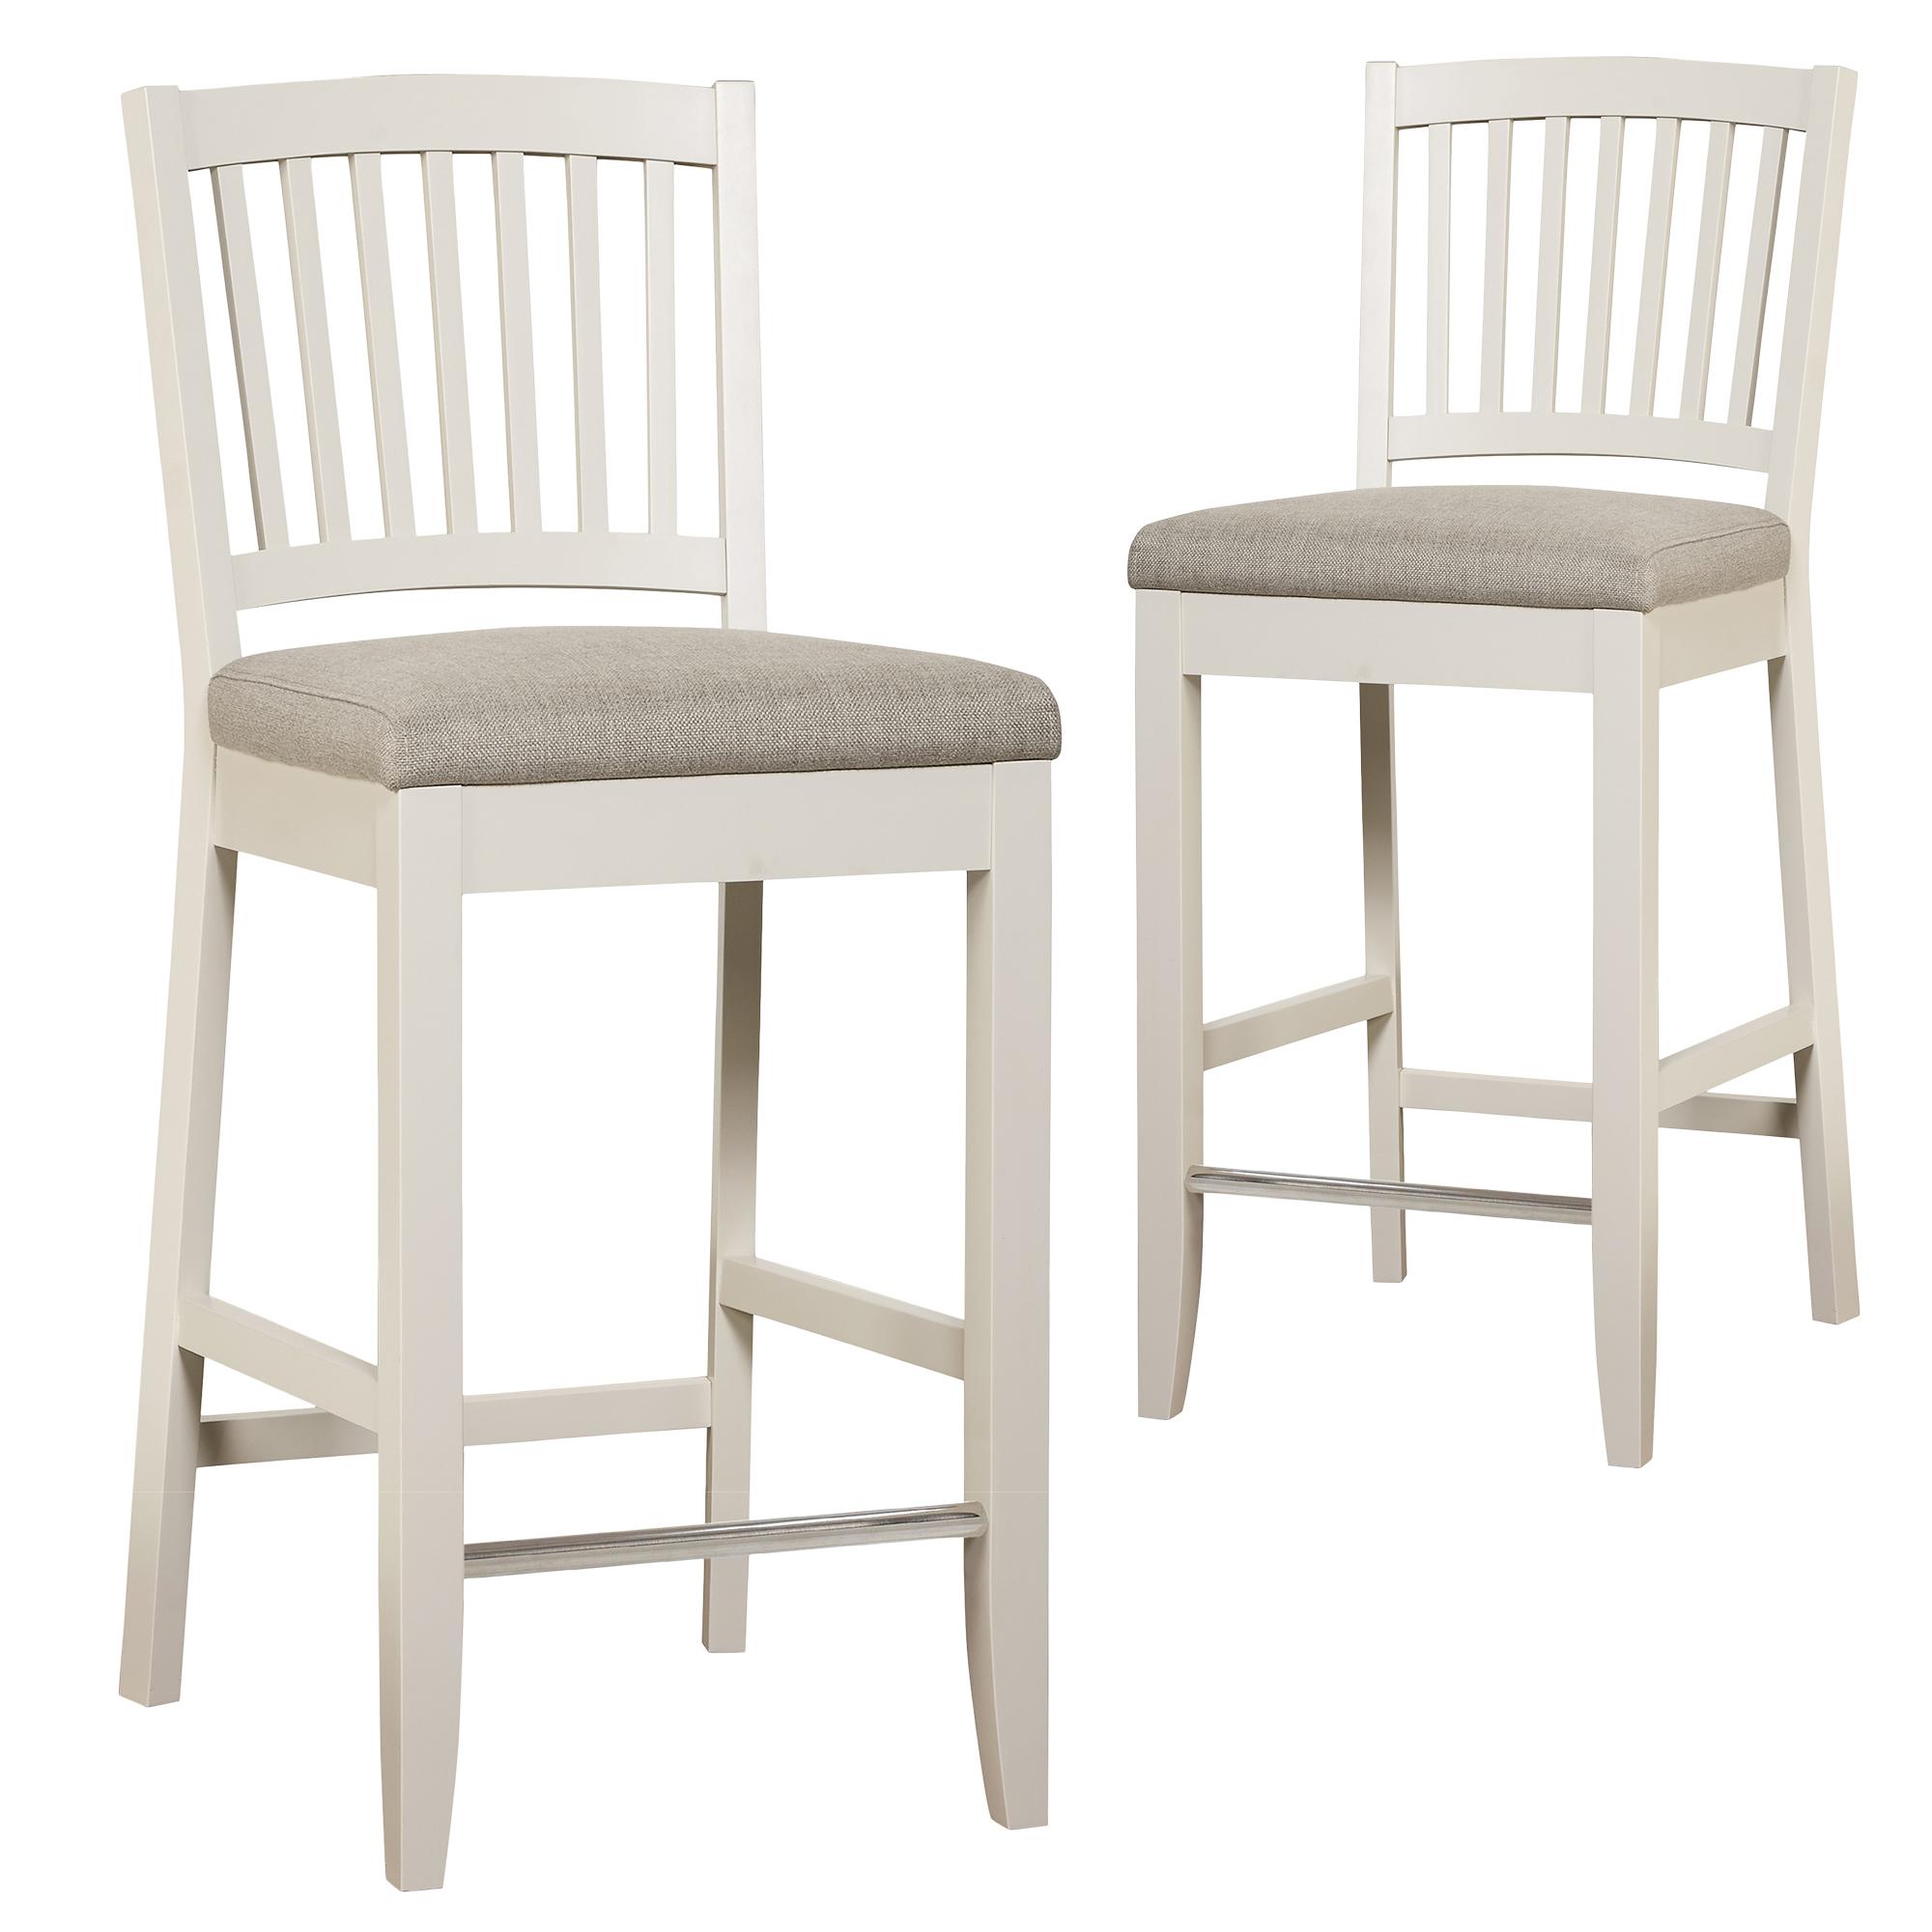 New set of 2 hamptons slat marbella fabric bar stools